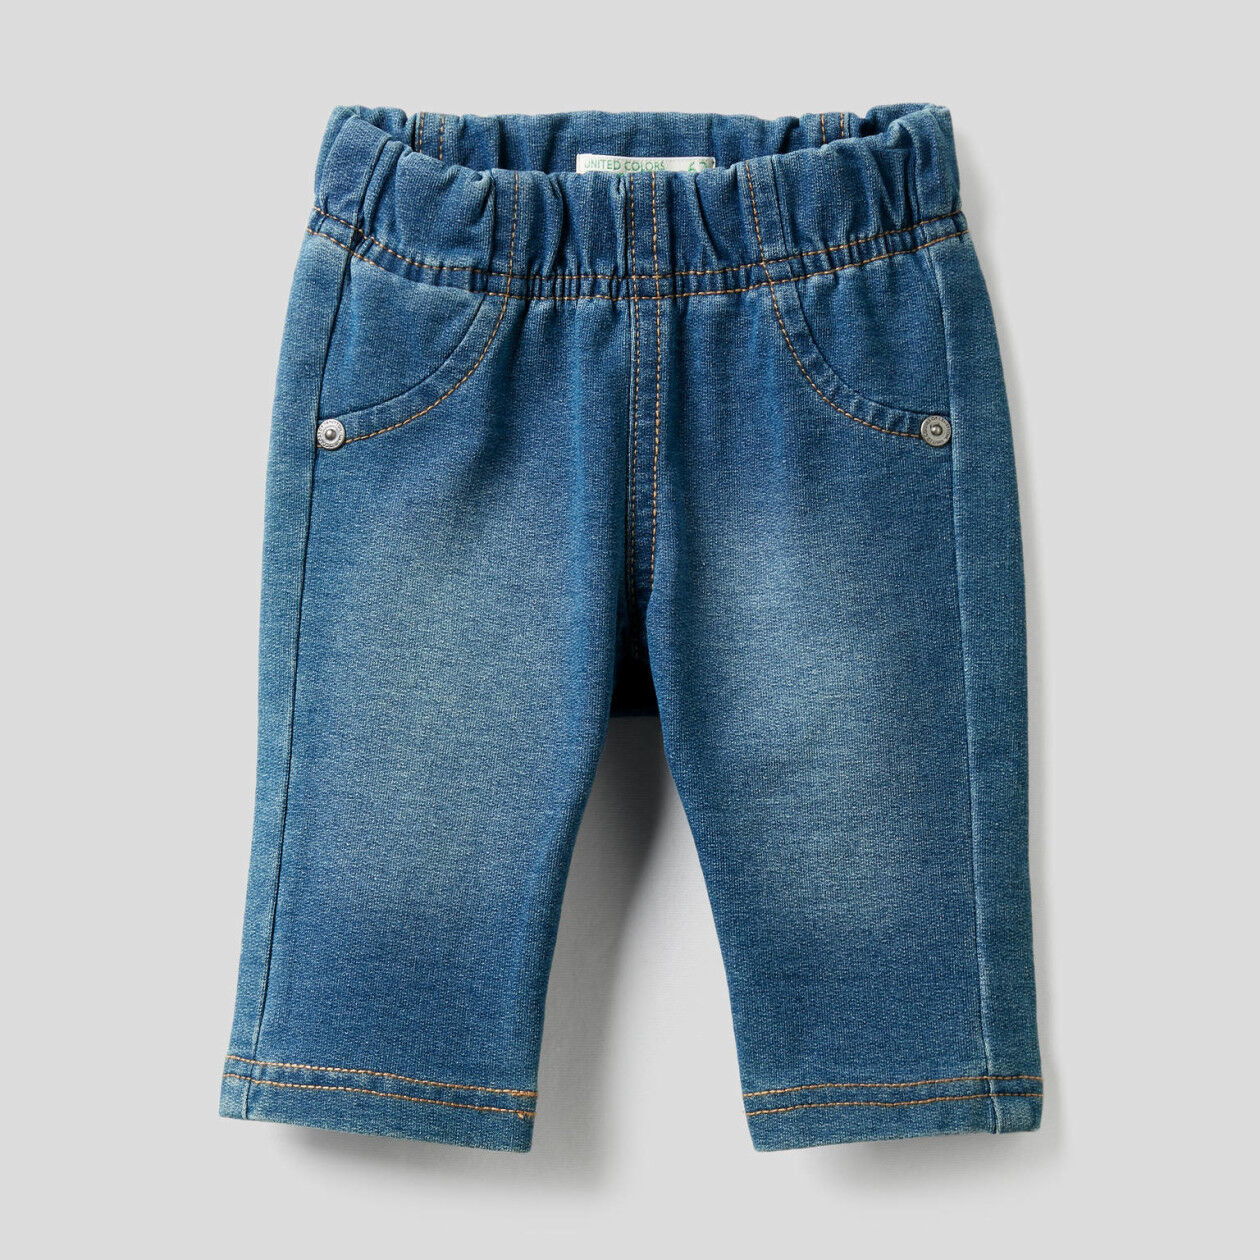 Denim look pants